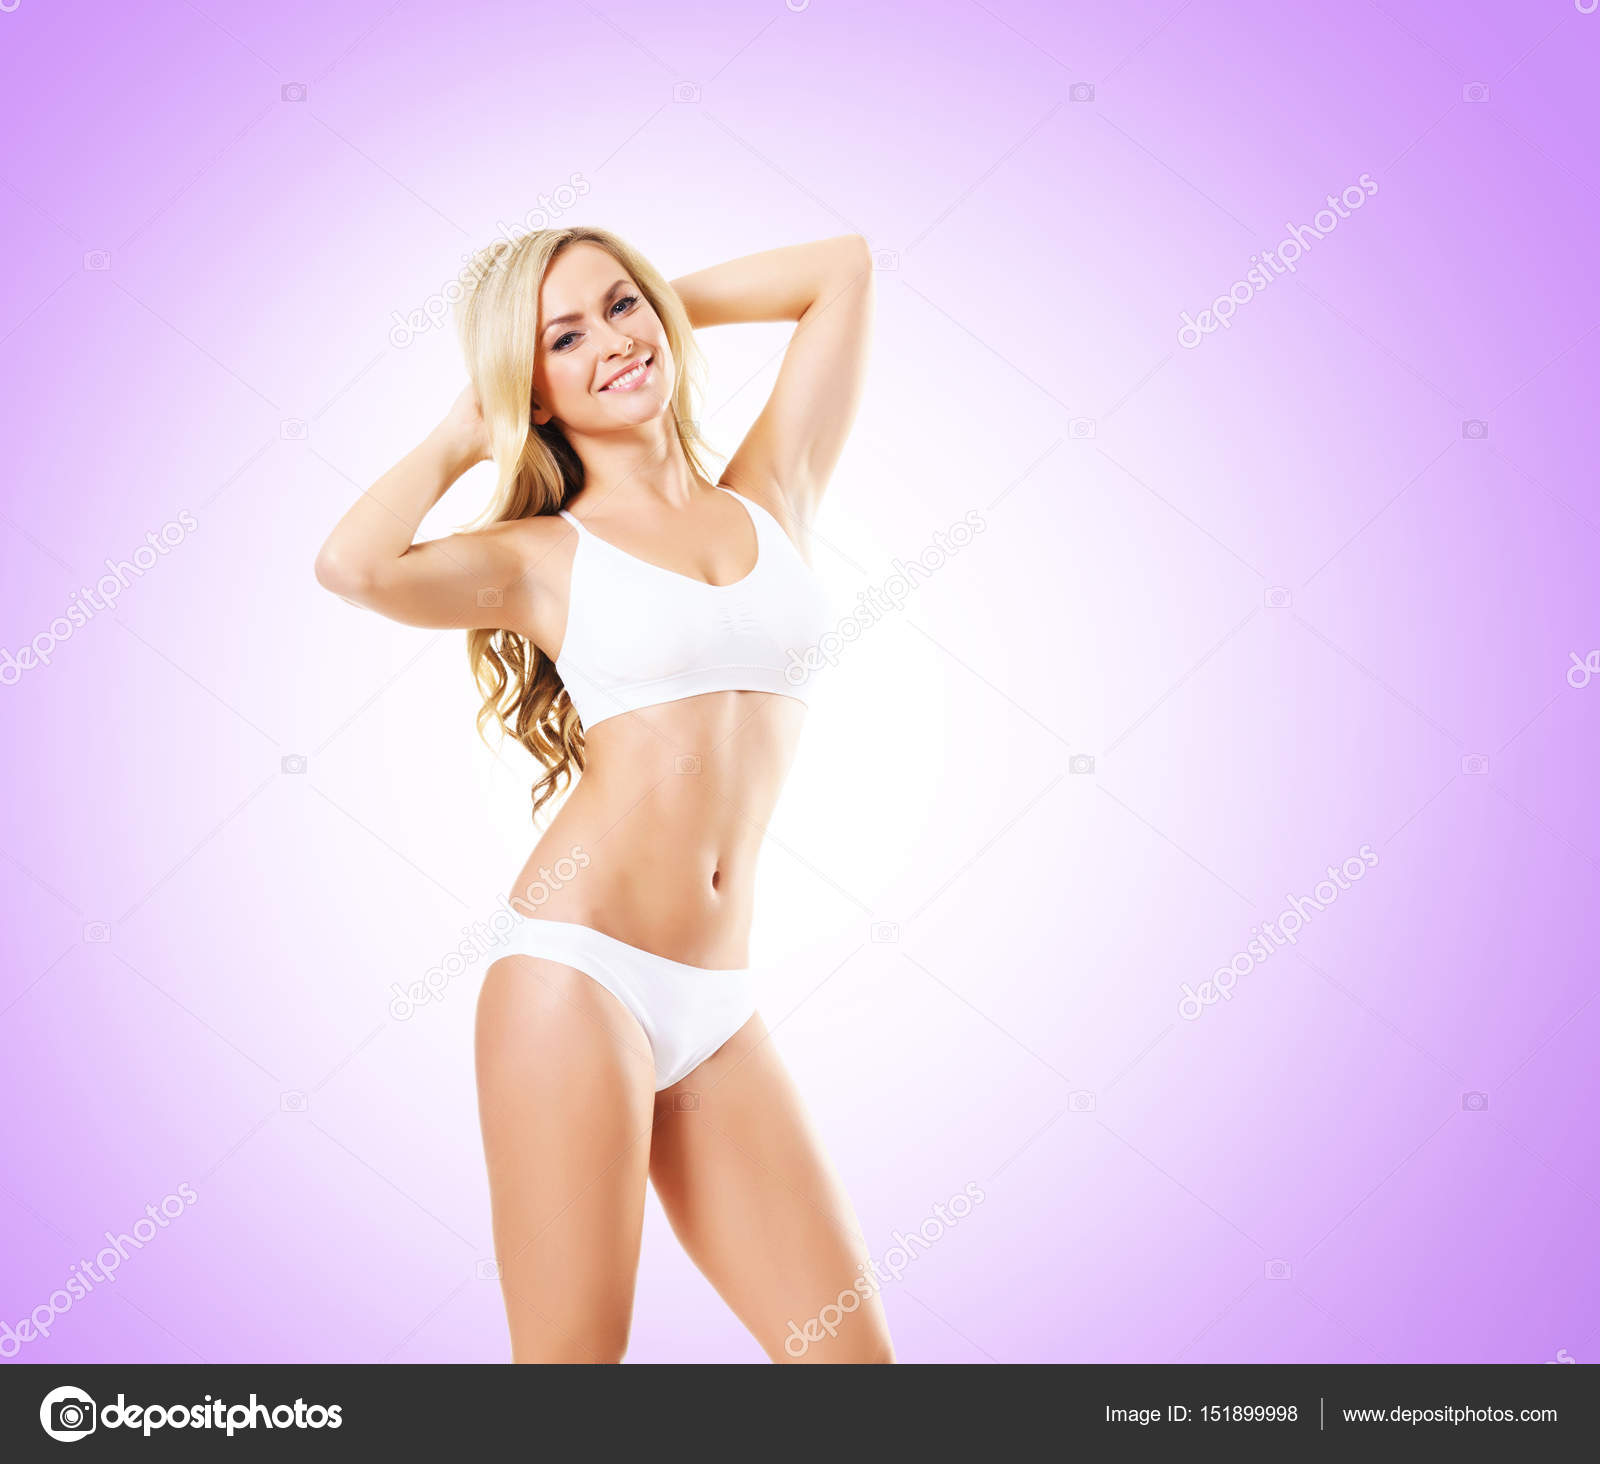 745dffa0210c67 Blonde Frau in weißen Dessous — Stockfoto © shmeljov #151899998